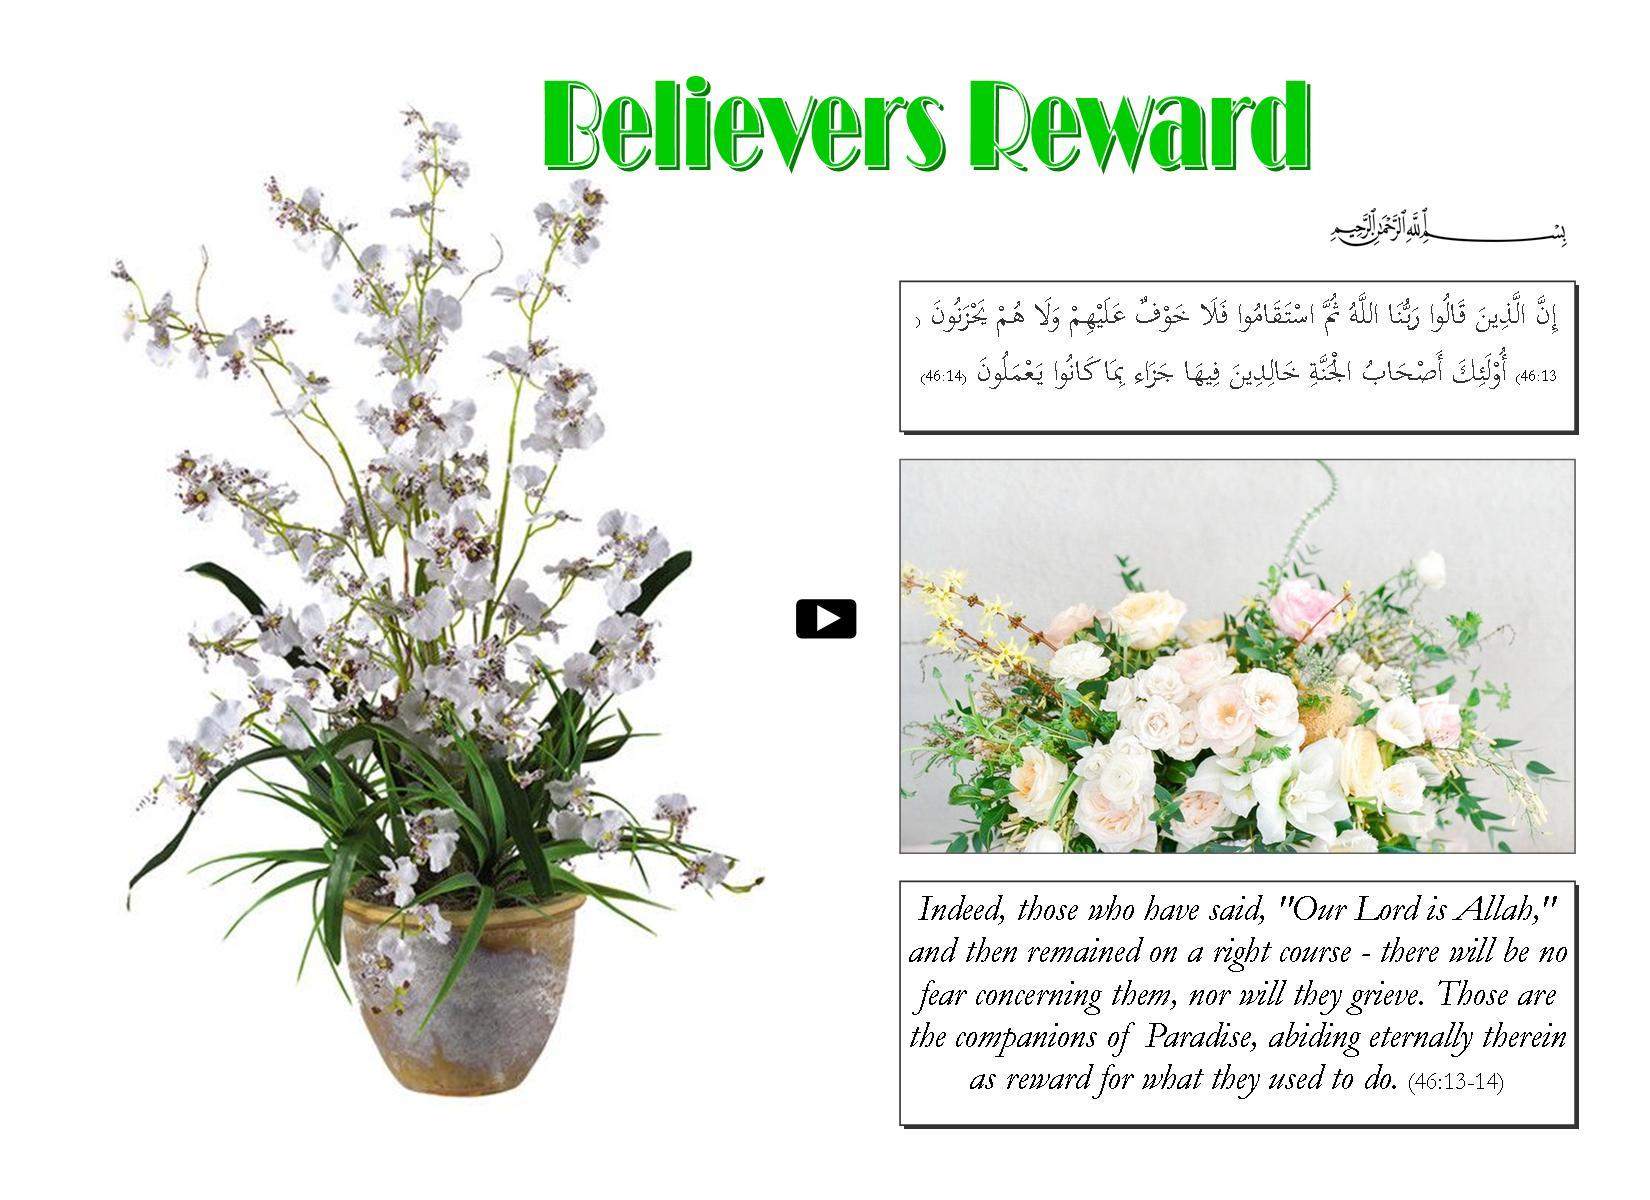 Believers Reward